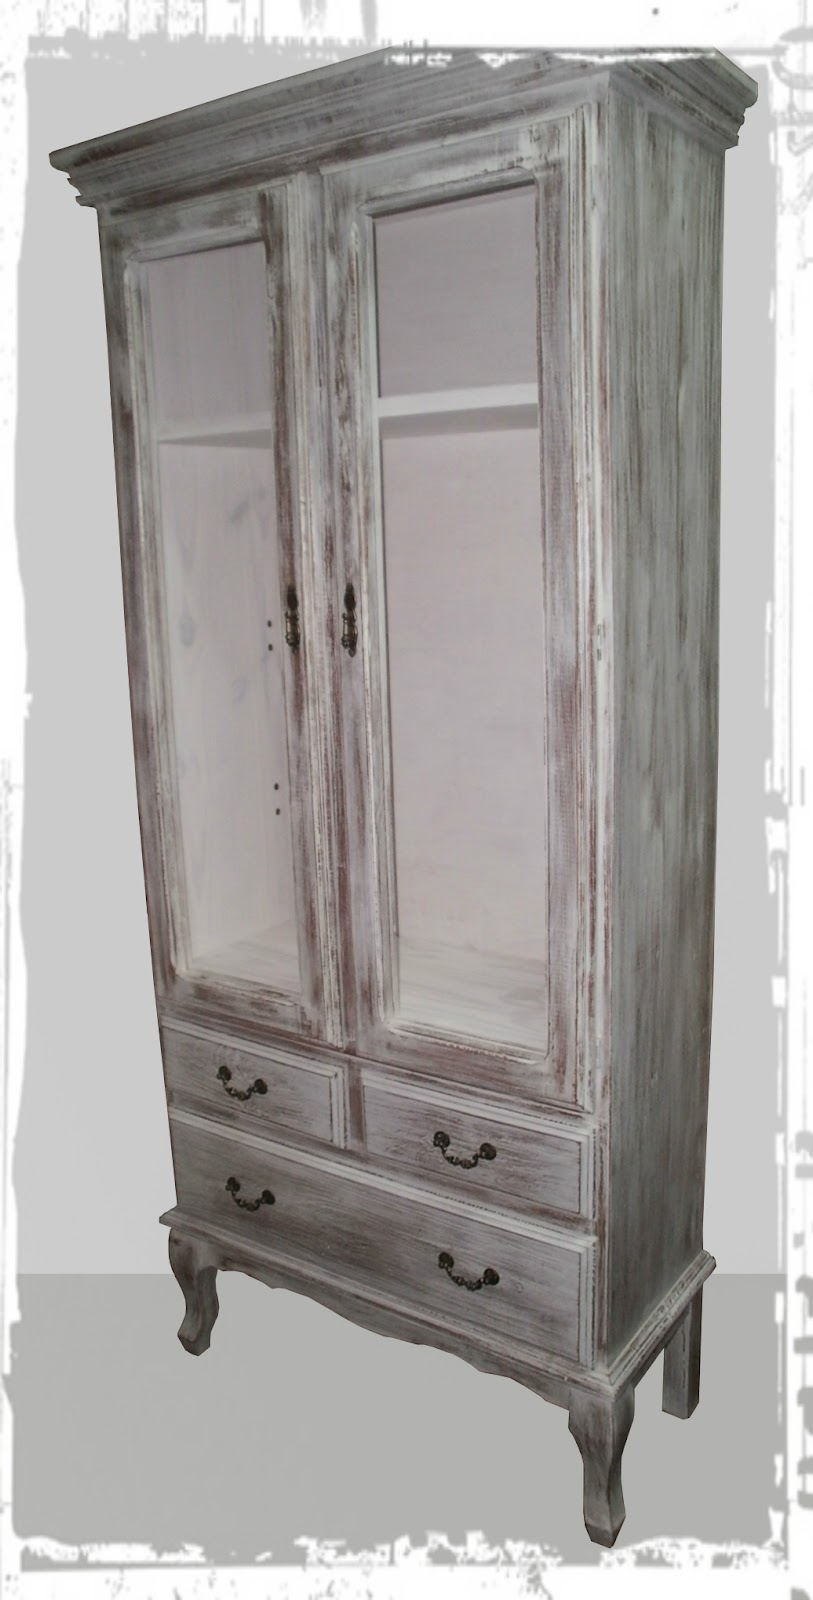 Las bartolitas picks muebles m s roperos - Ropero antiguo ...